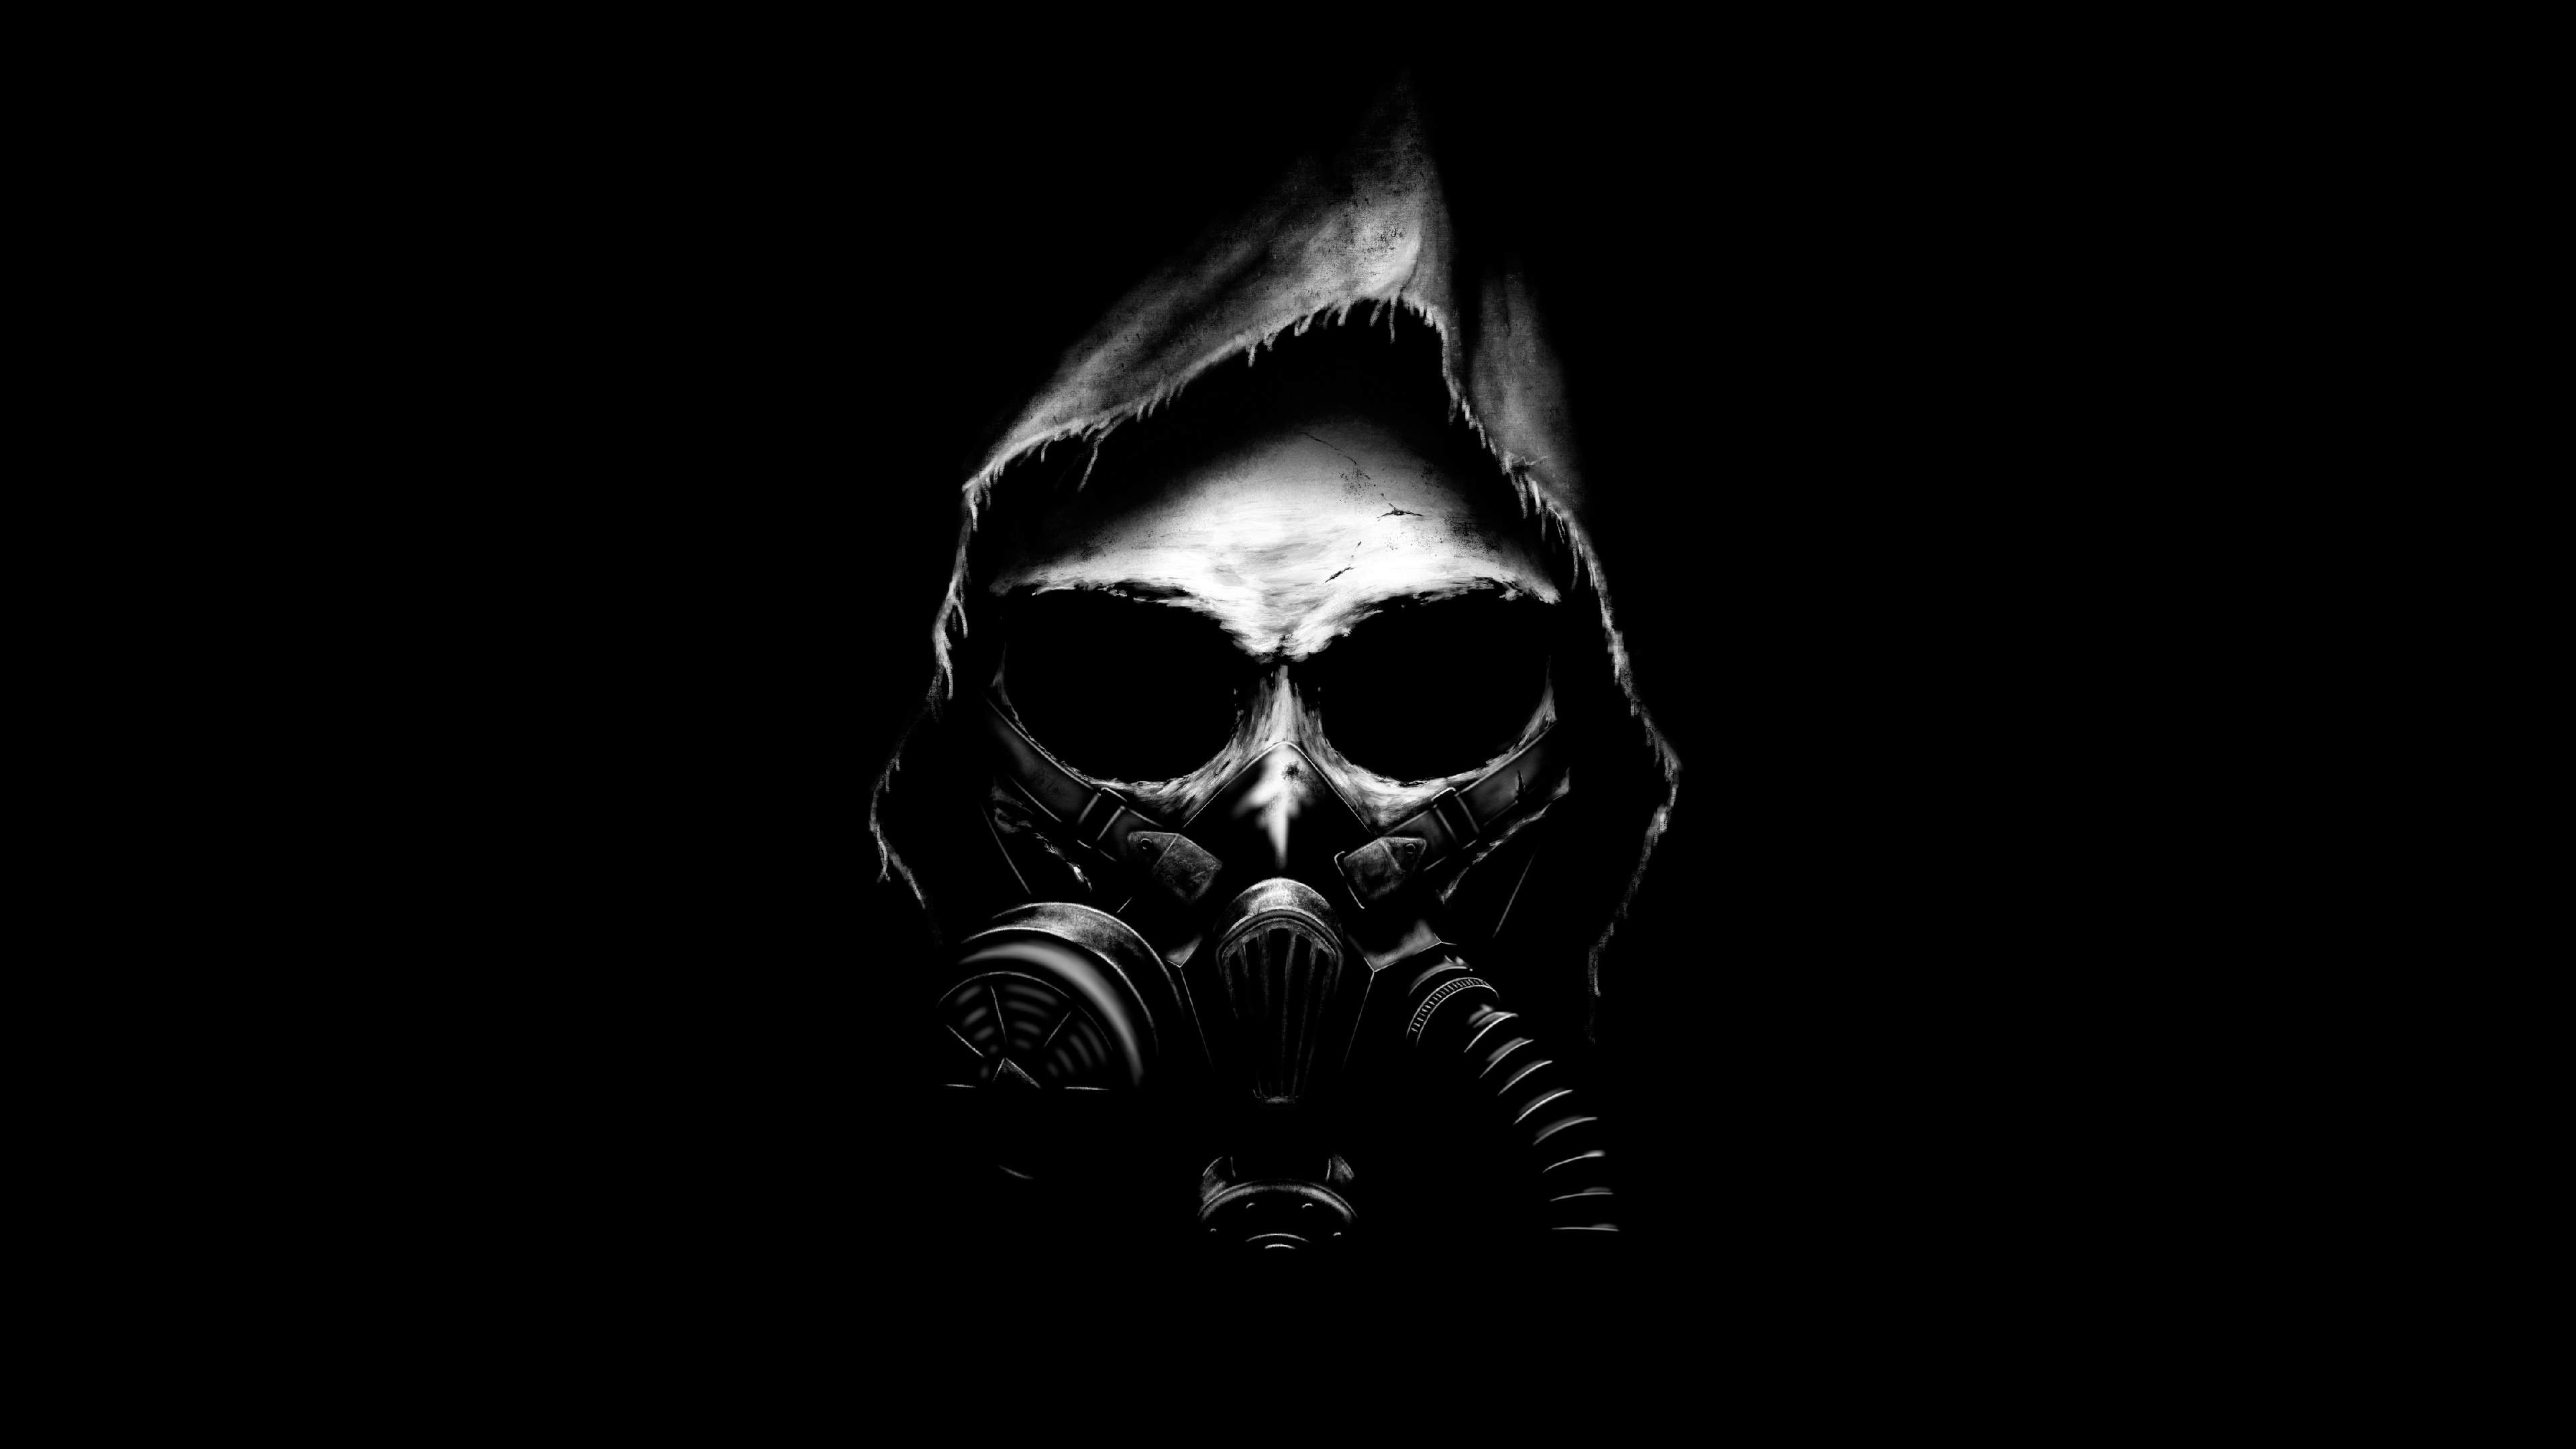 Monochrome skull in gas mask wallpaper